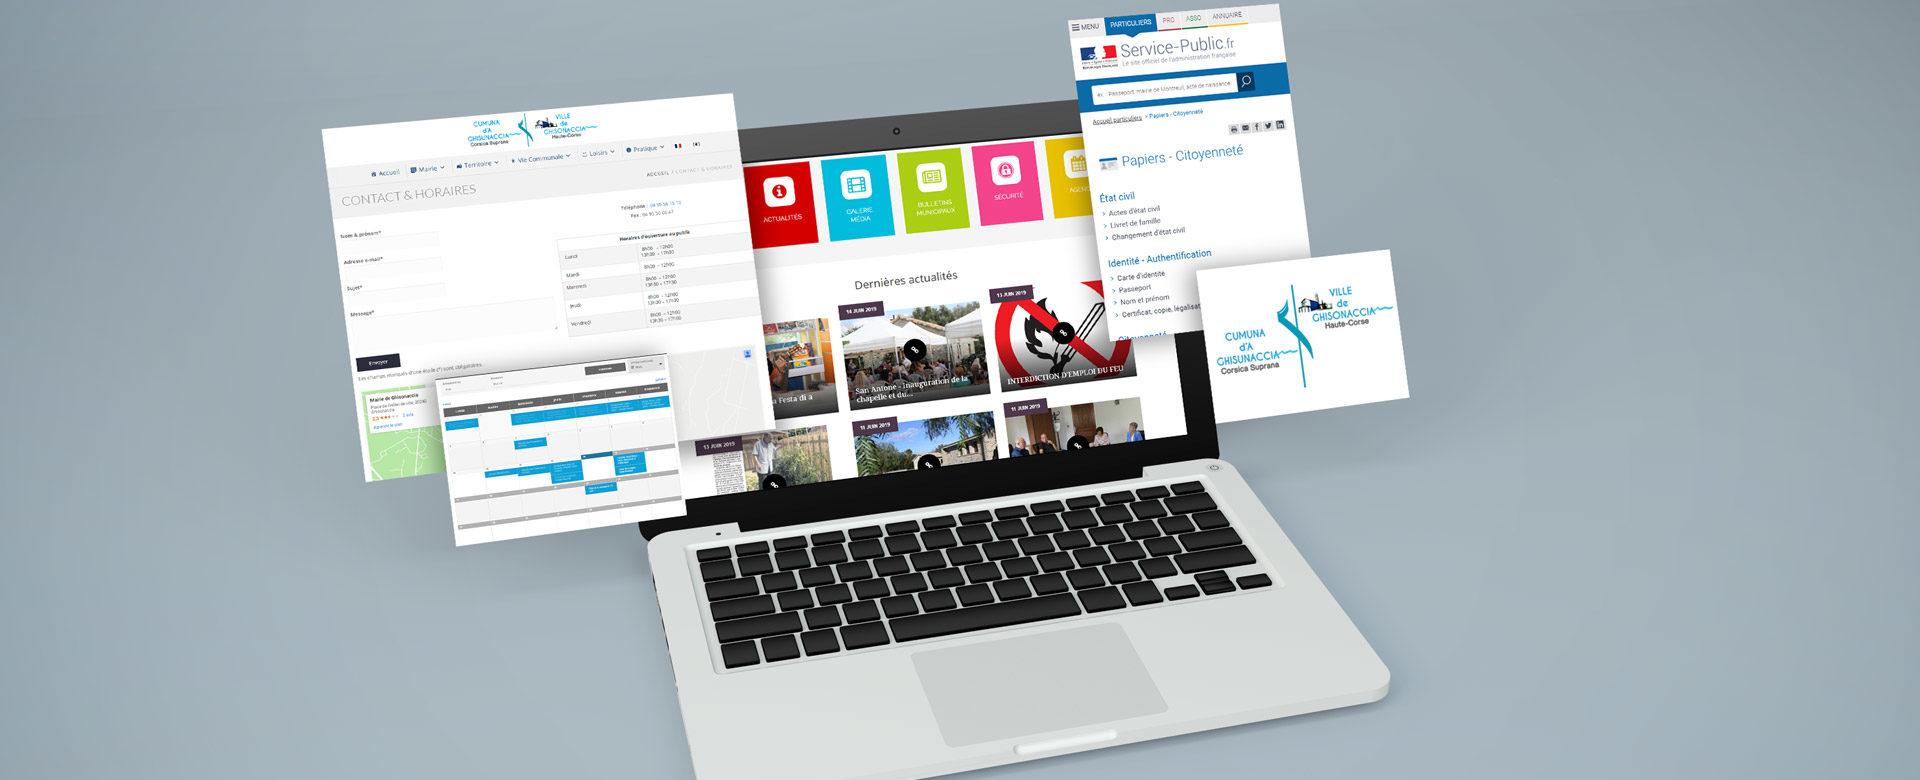 mairie-ghisonaccia-siteweb-corse